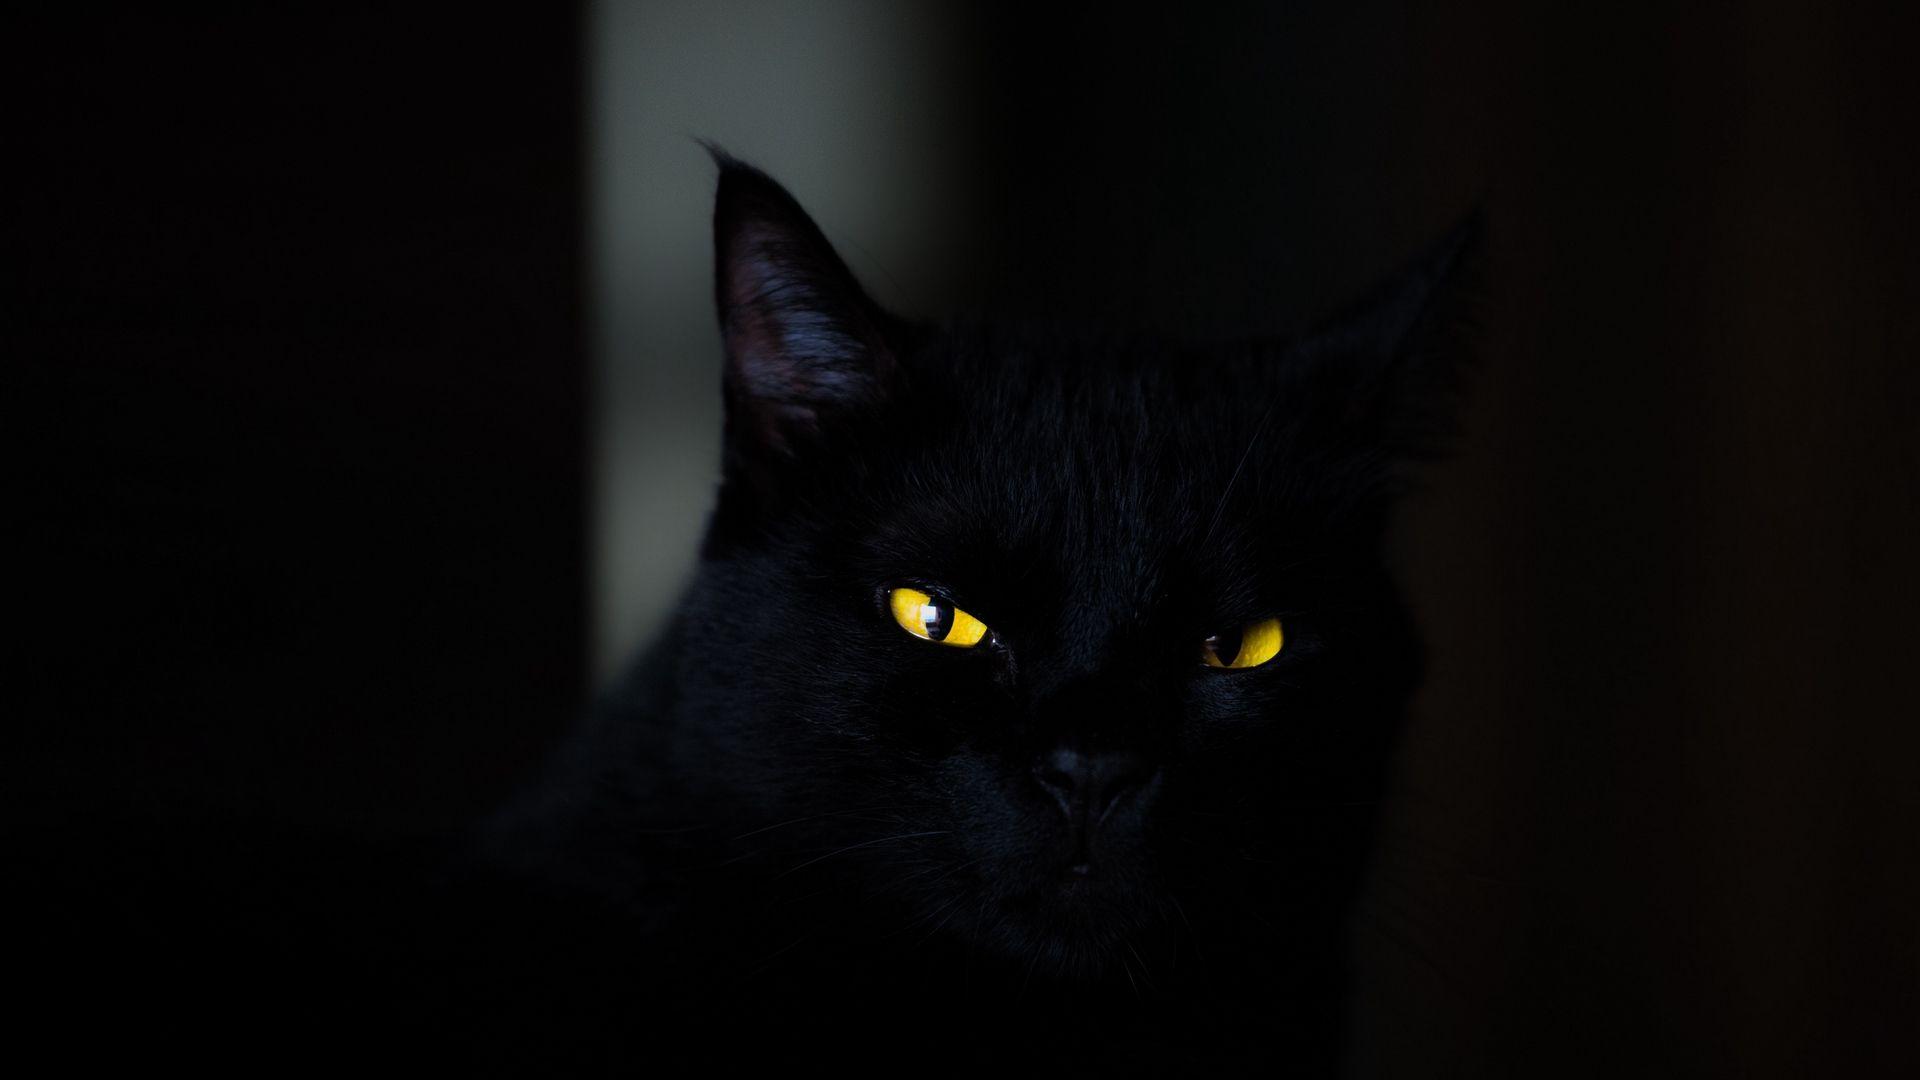 Black Cat 1920x1080 Black Cat Black Aesthetic Wallpaper Black Cats Rock